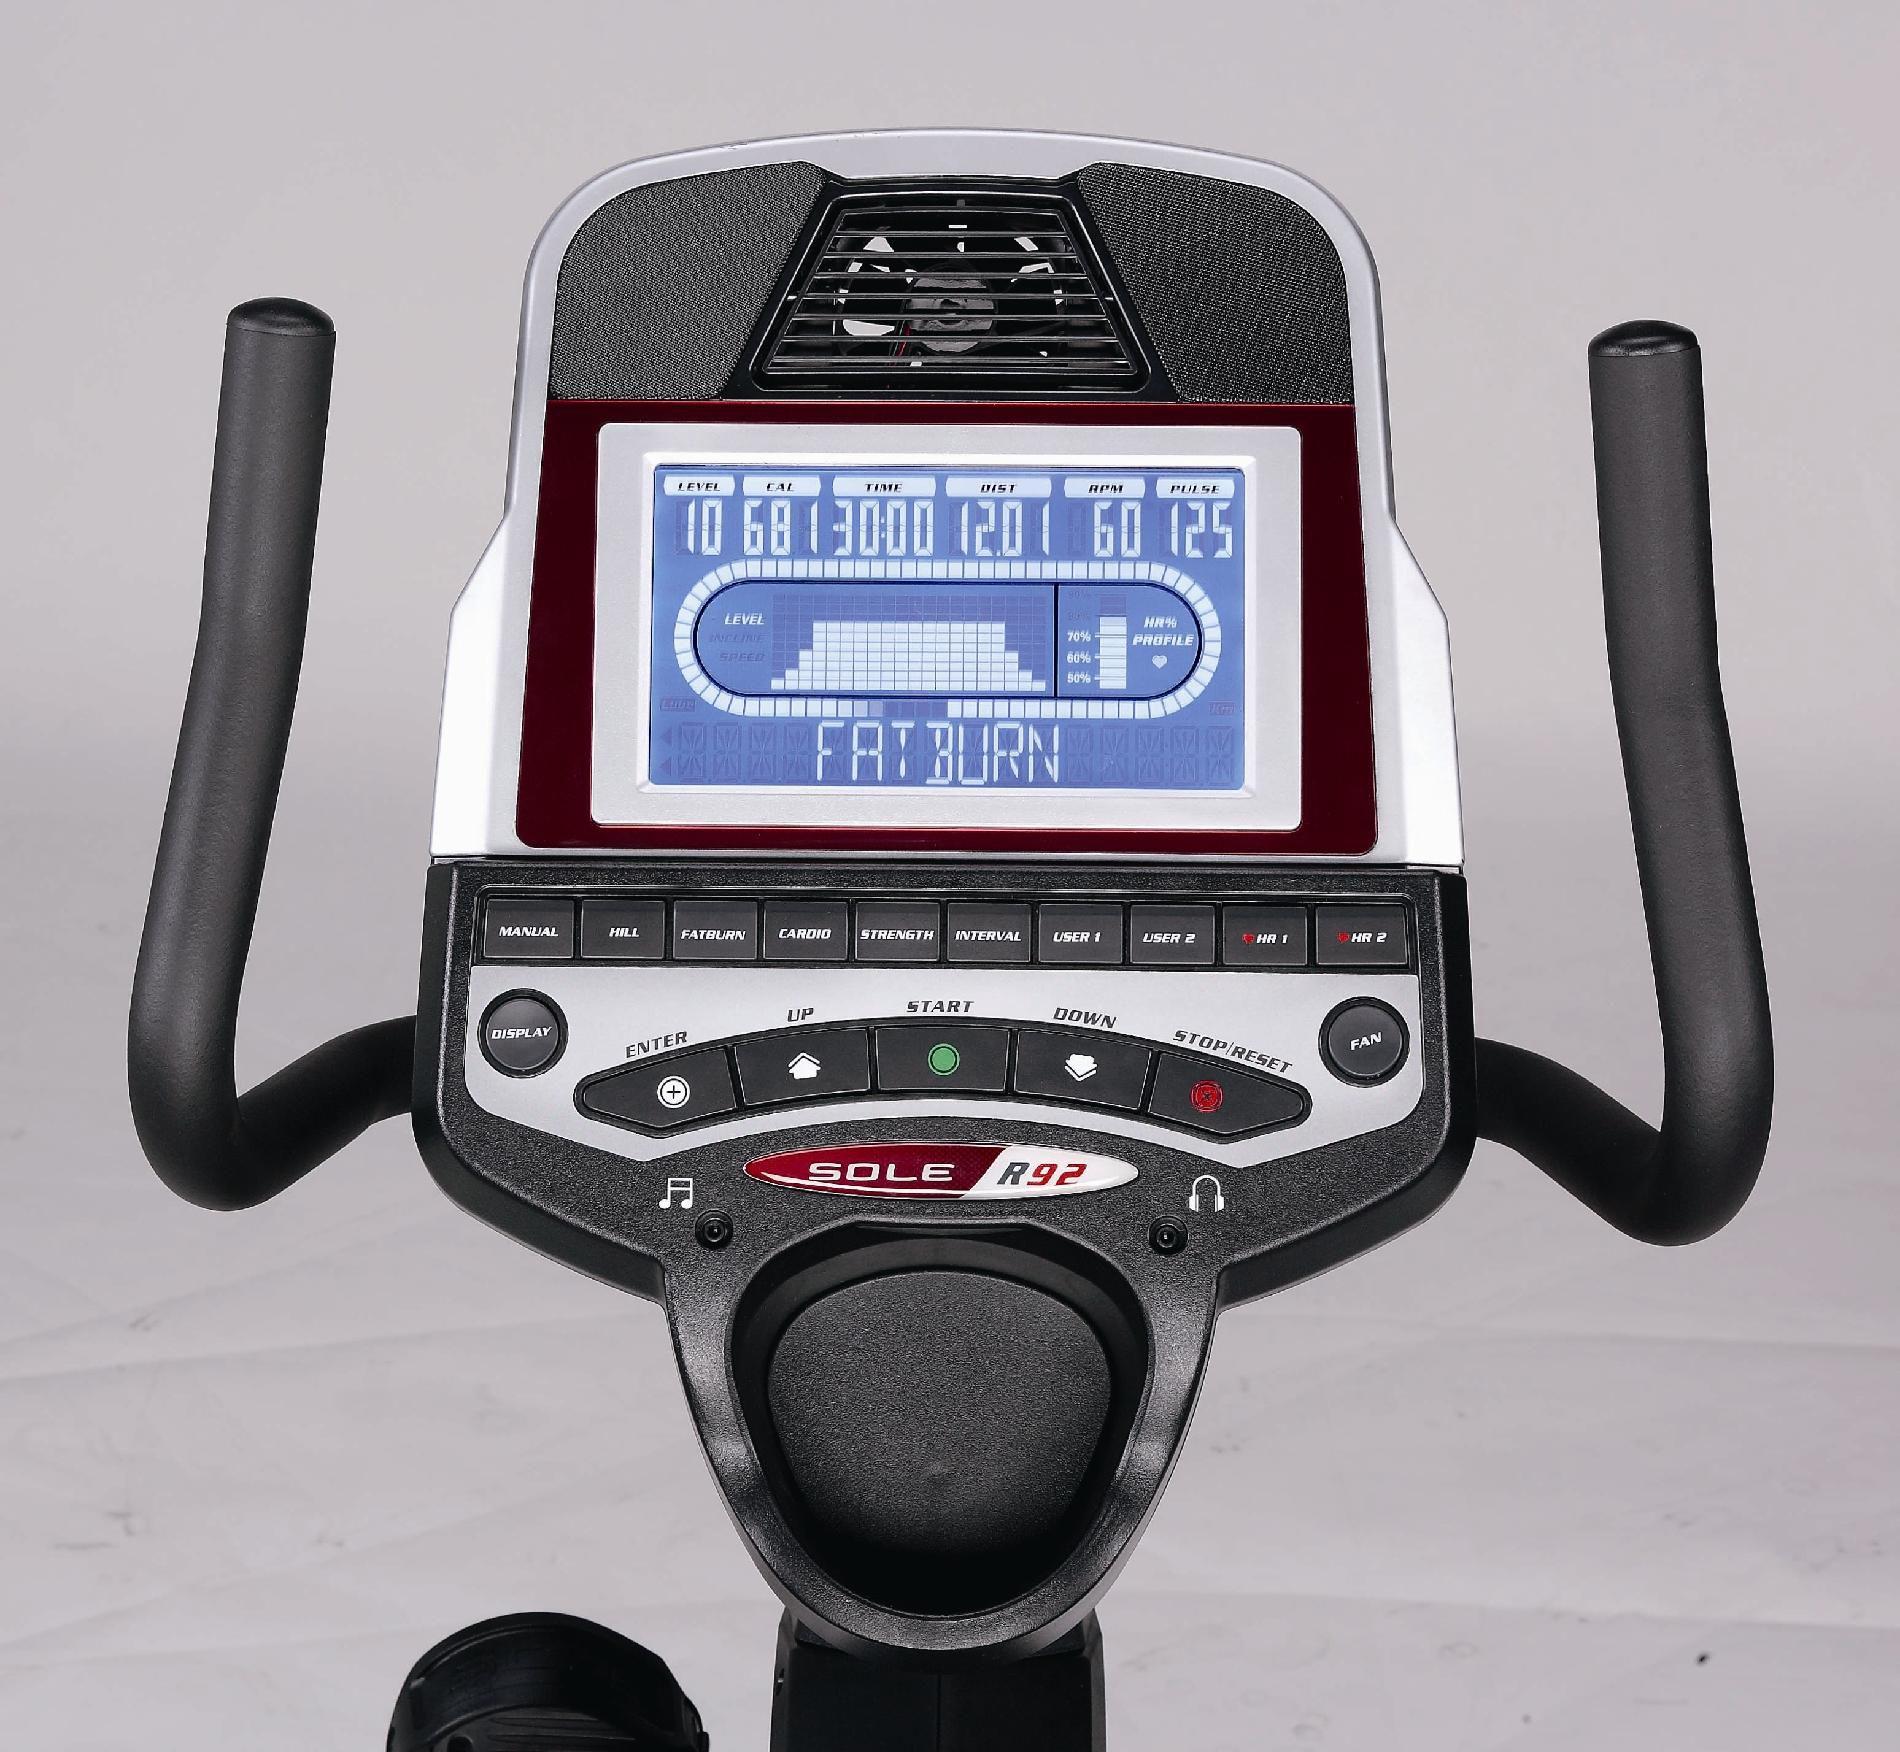 Sole R92 Recumbent Exercise Bike